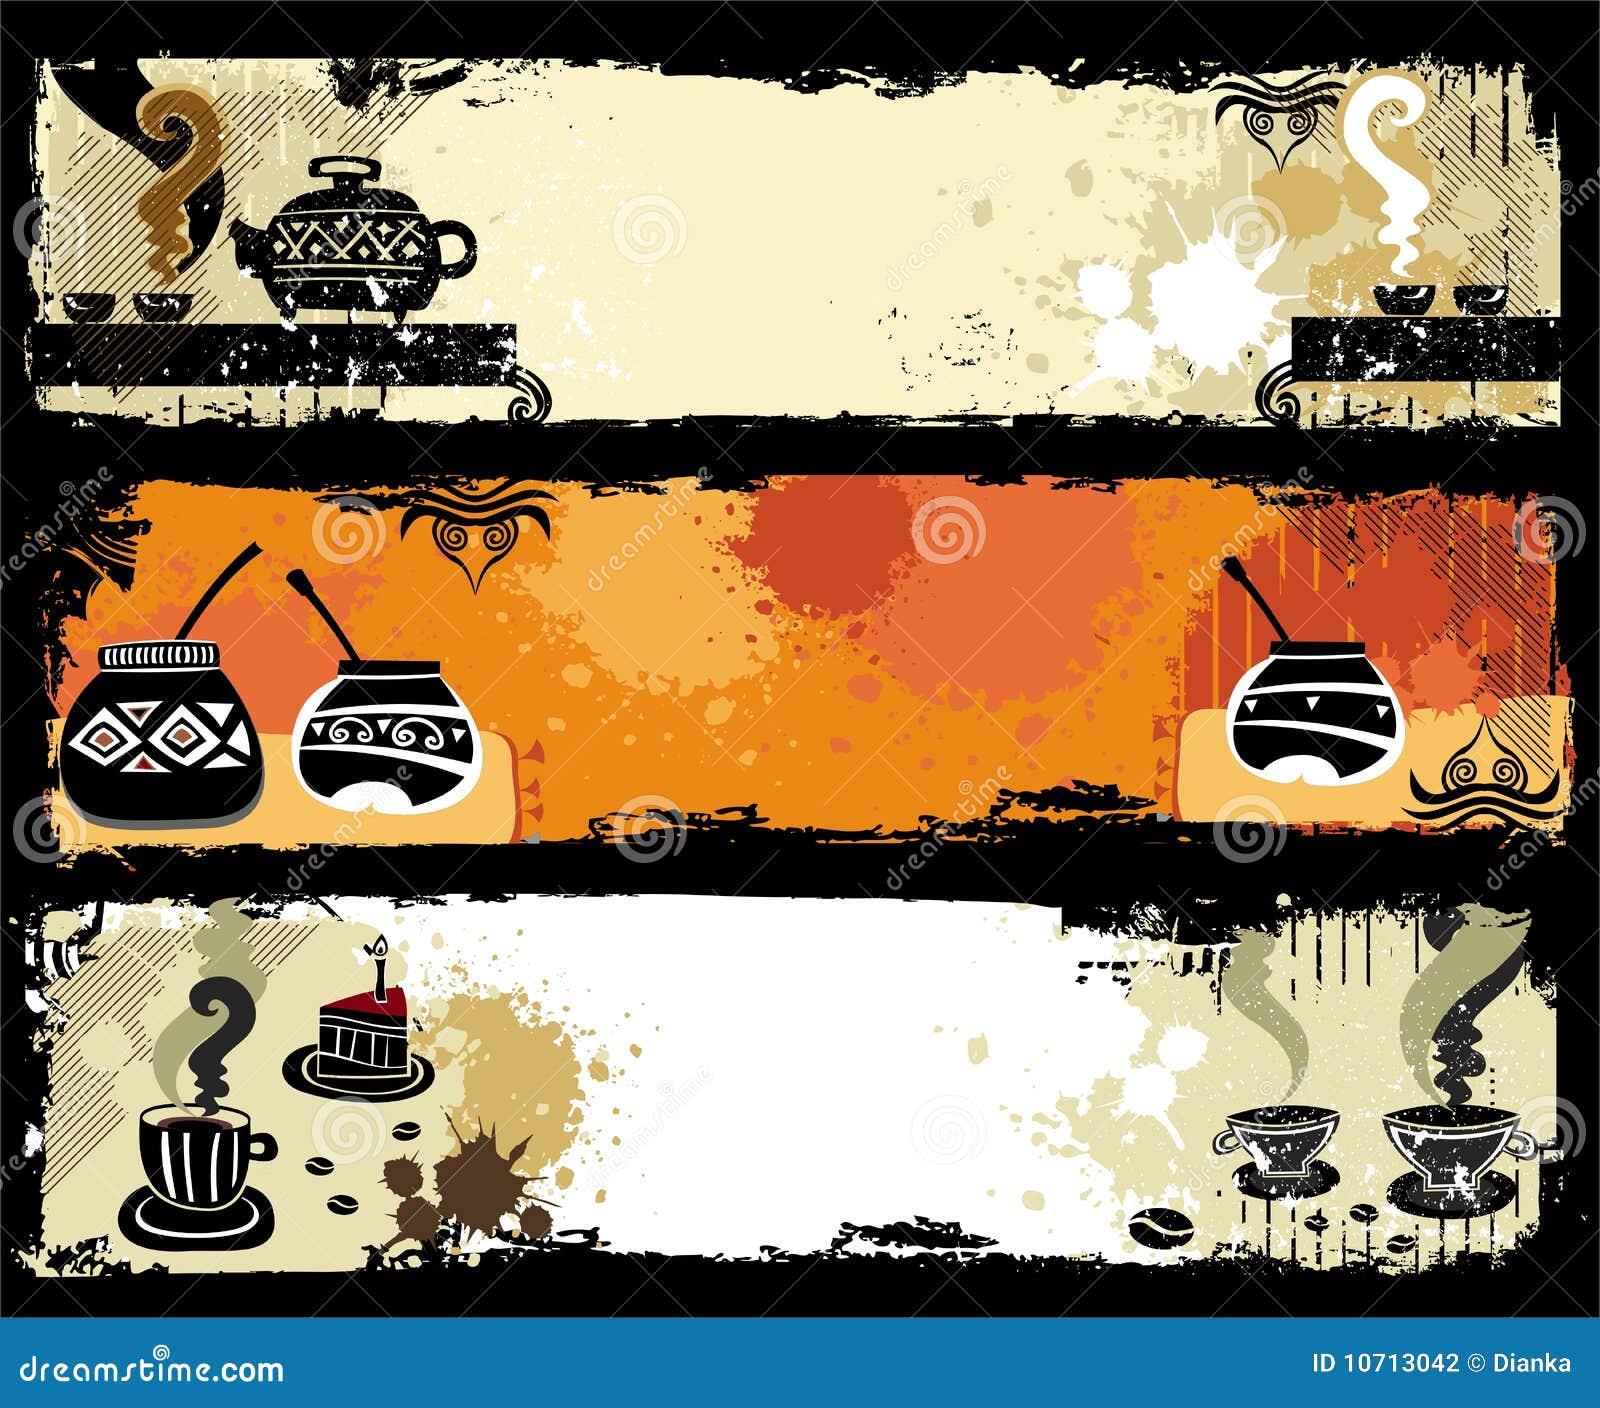 Tea, coffee, yerba mate banners.